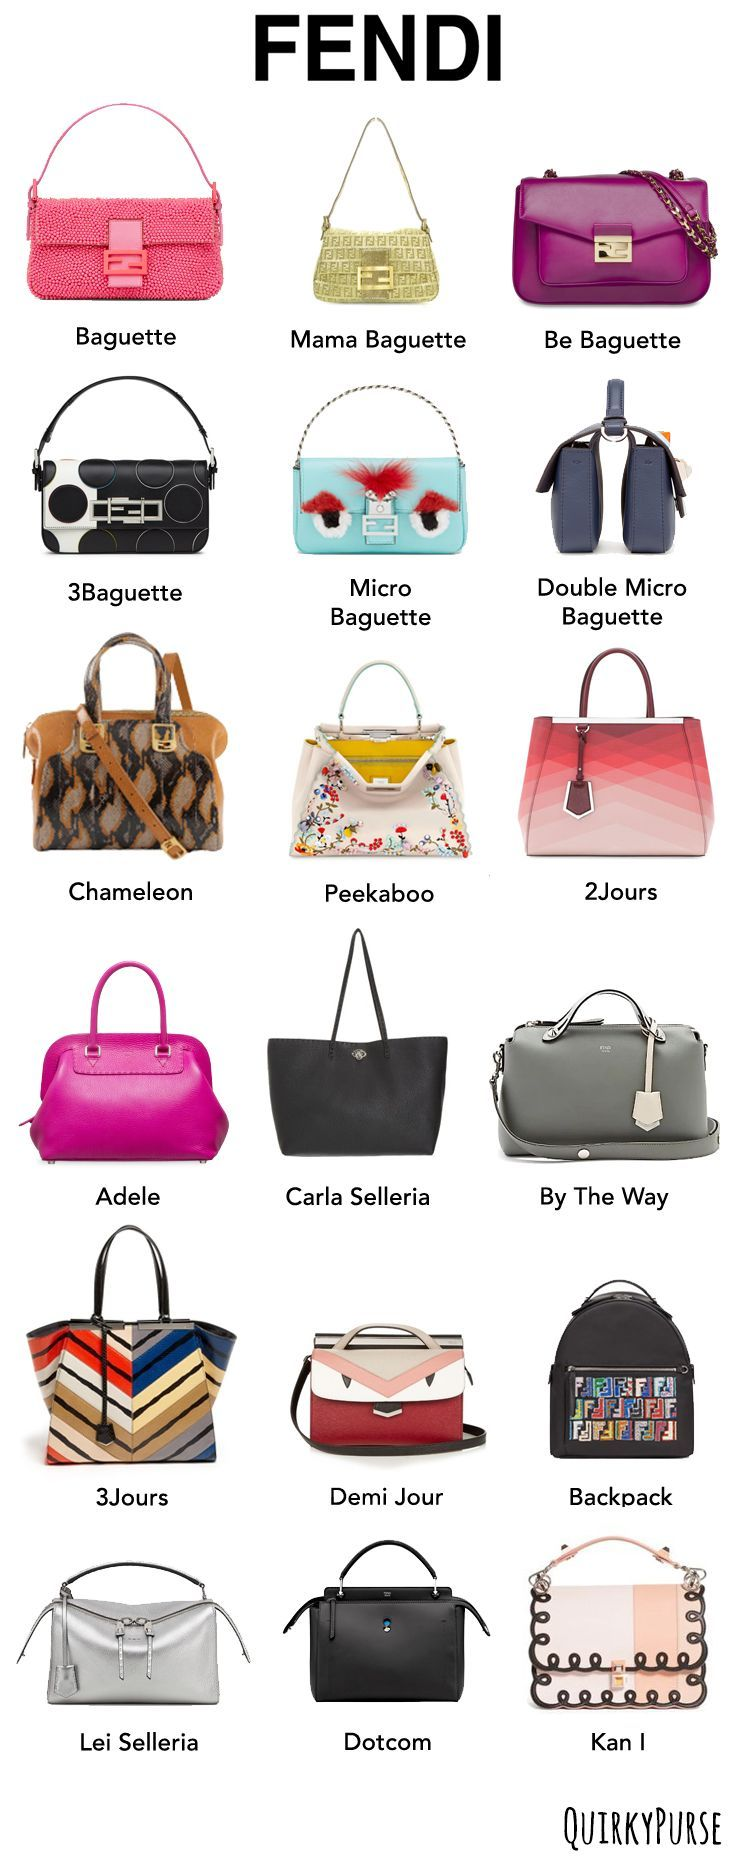 39b9515e0d82 Fendi Bags Reference Guide